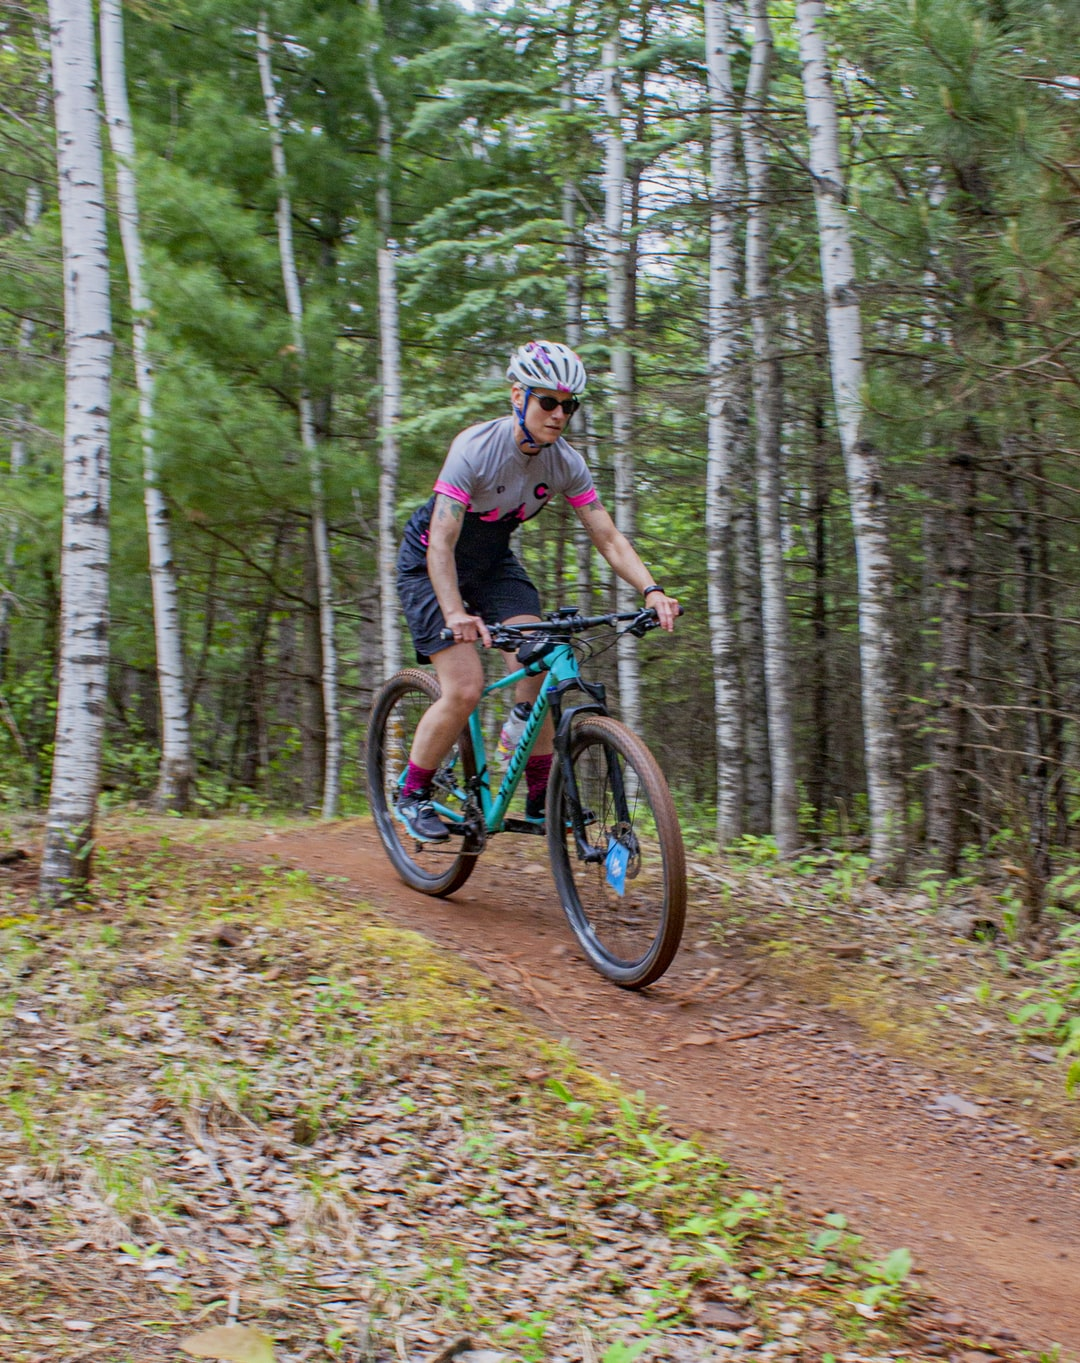 Female Mountain Biking on Trails